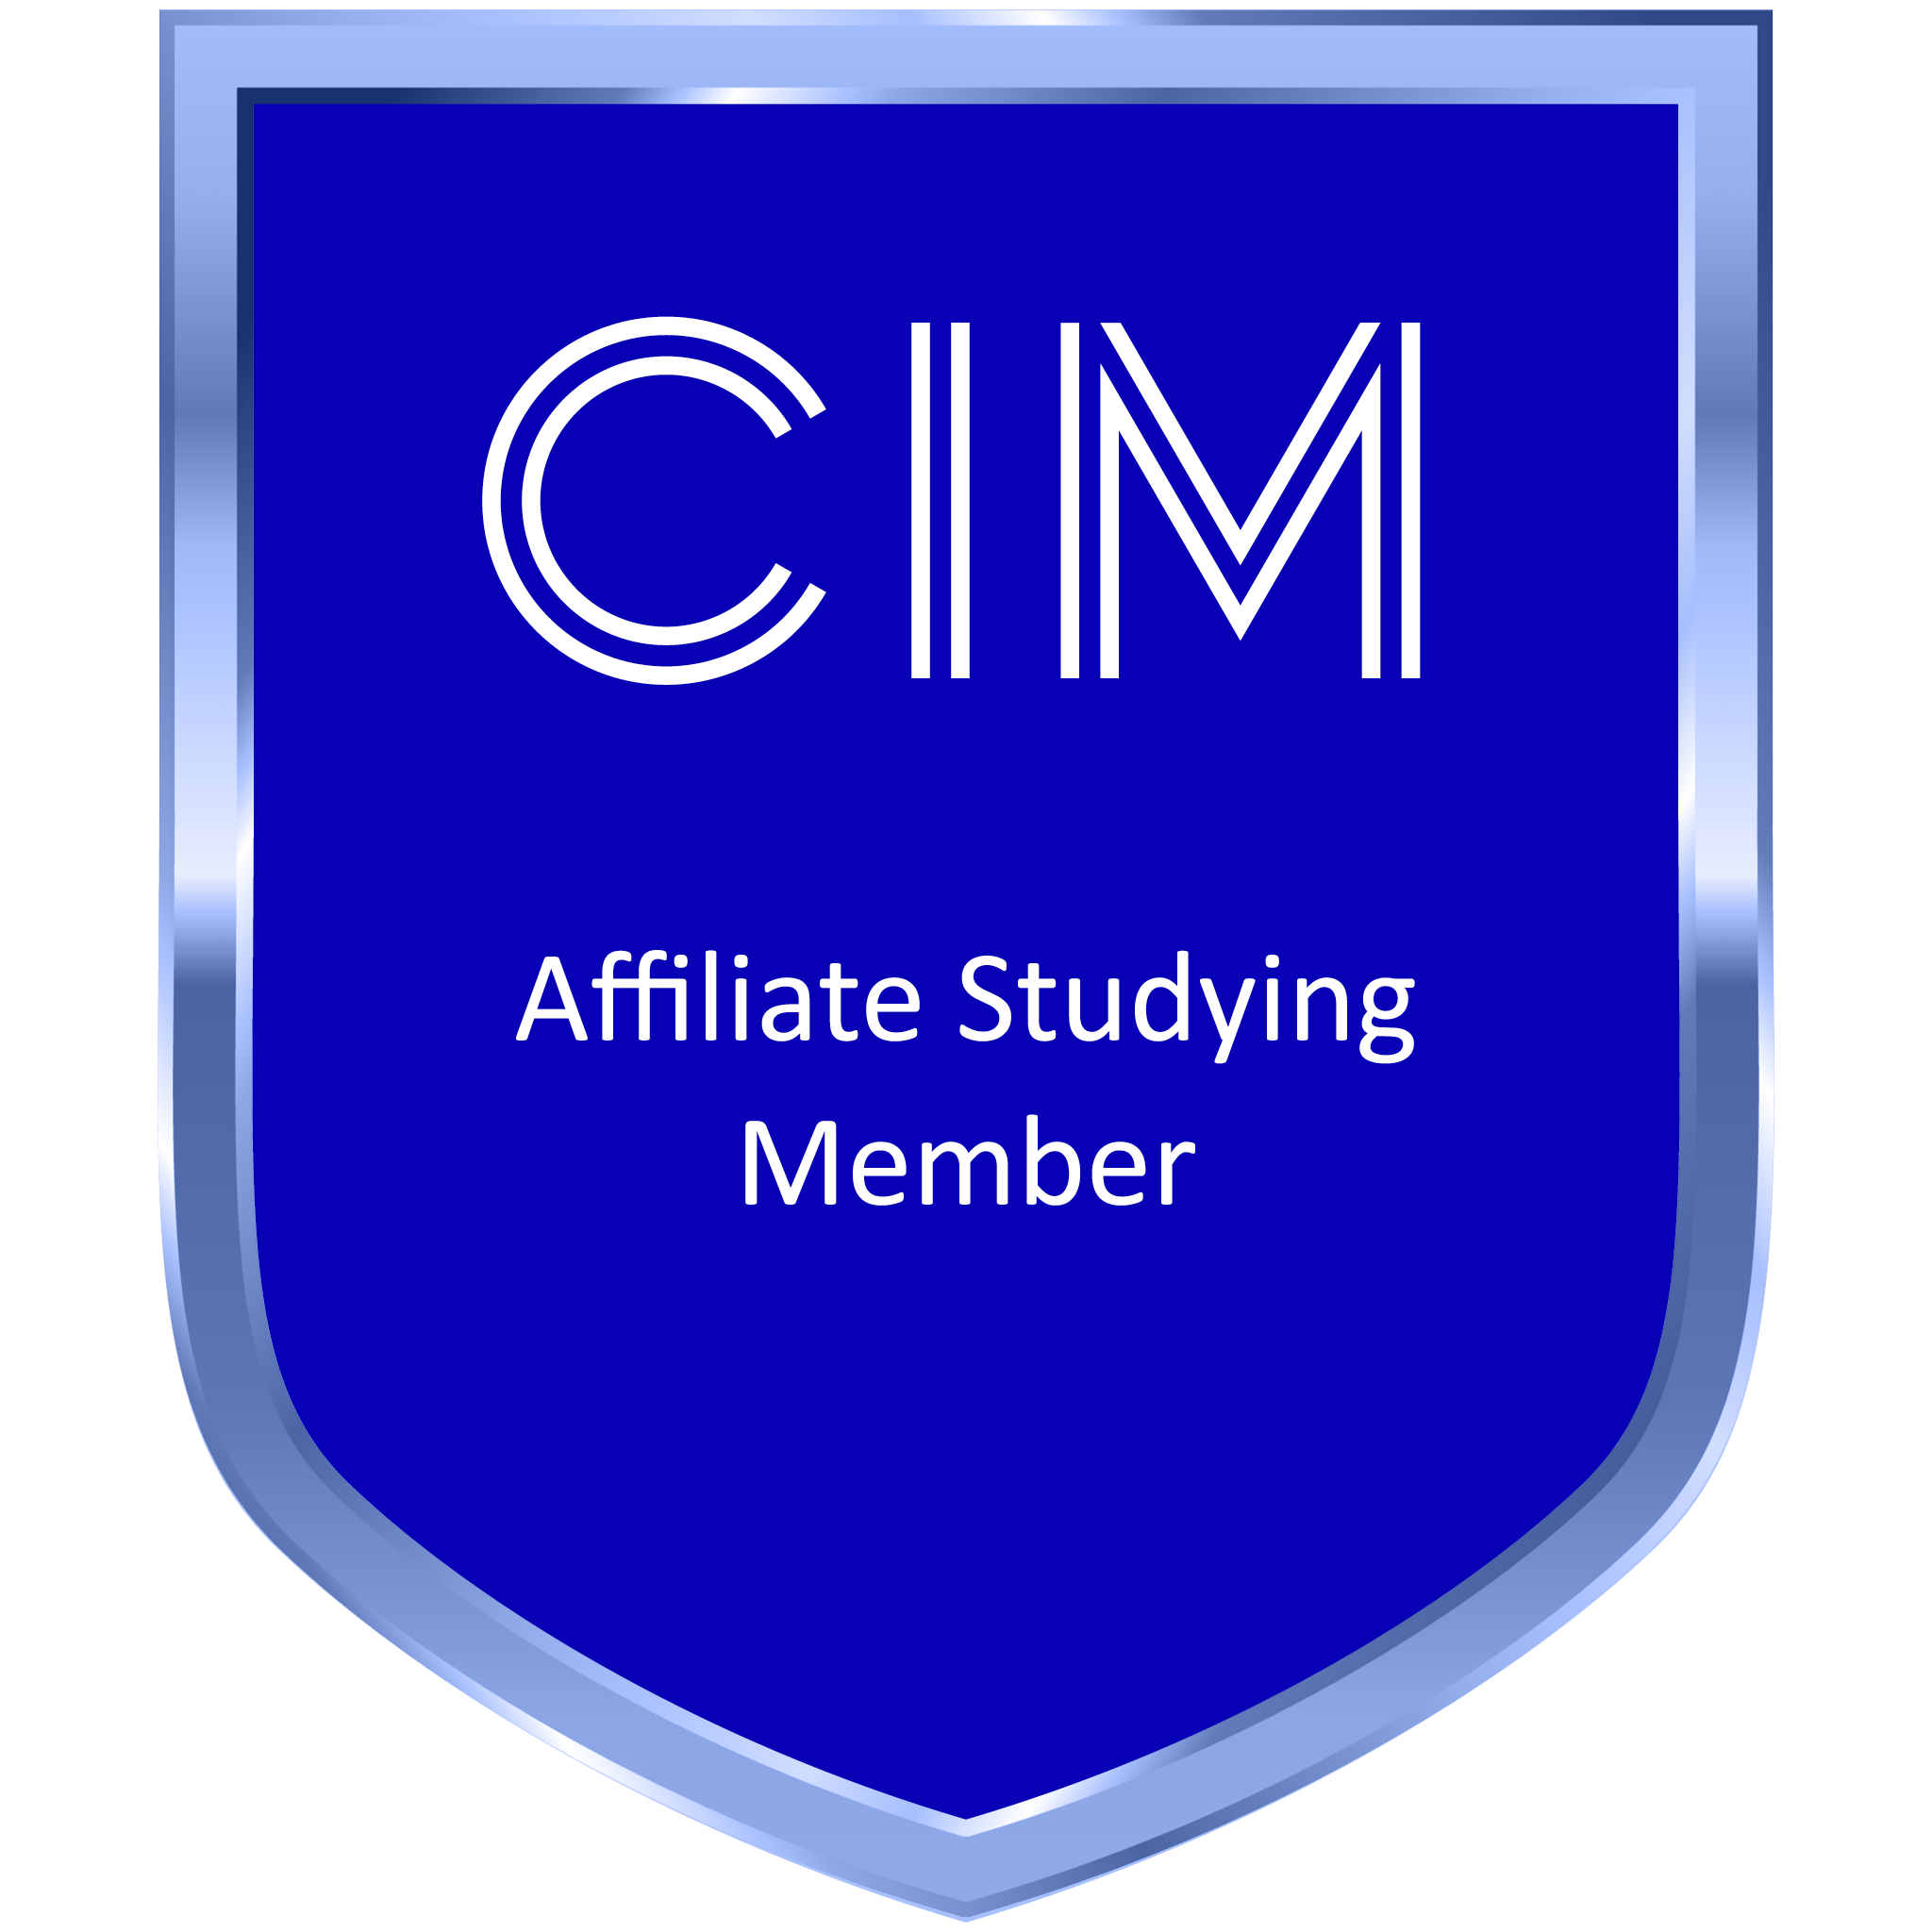 CIM Affiliate Studying Member